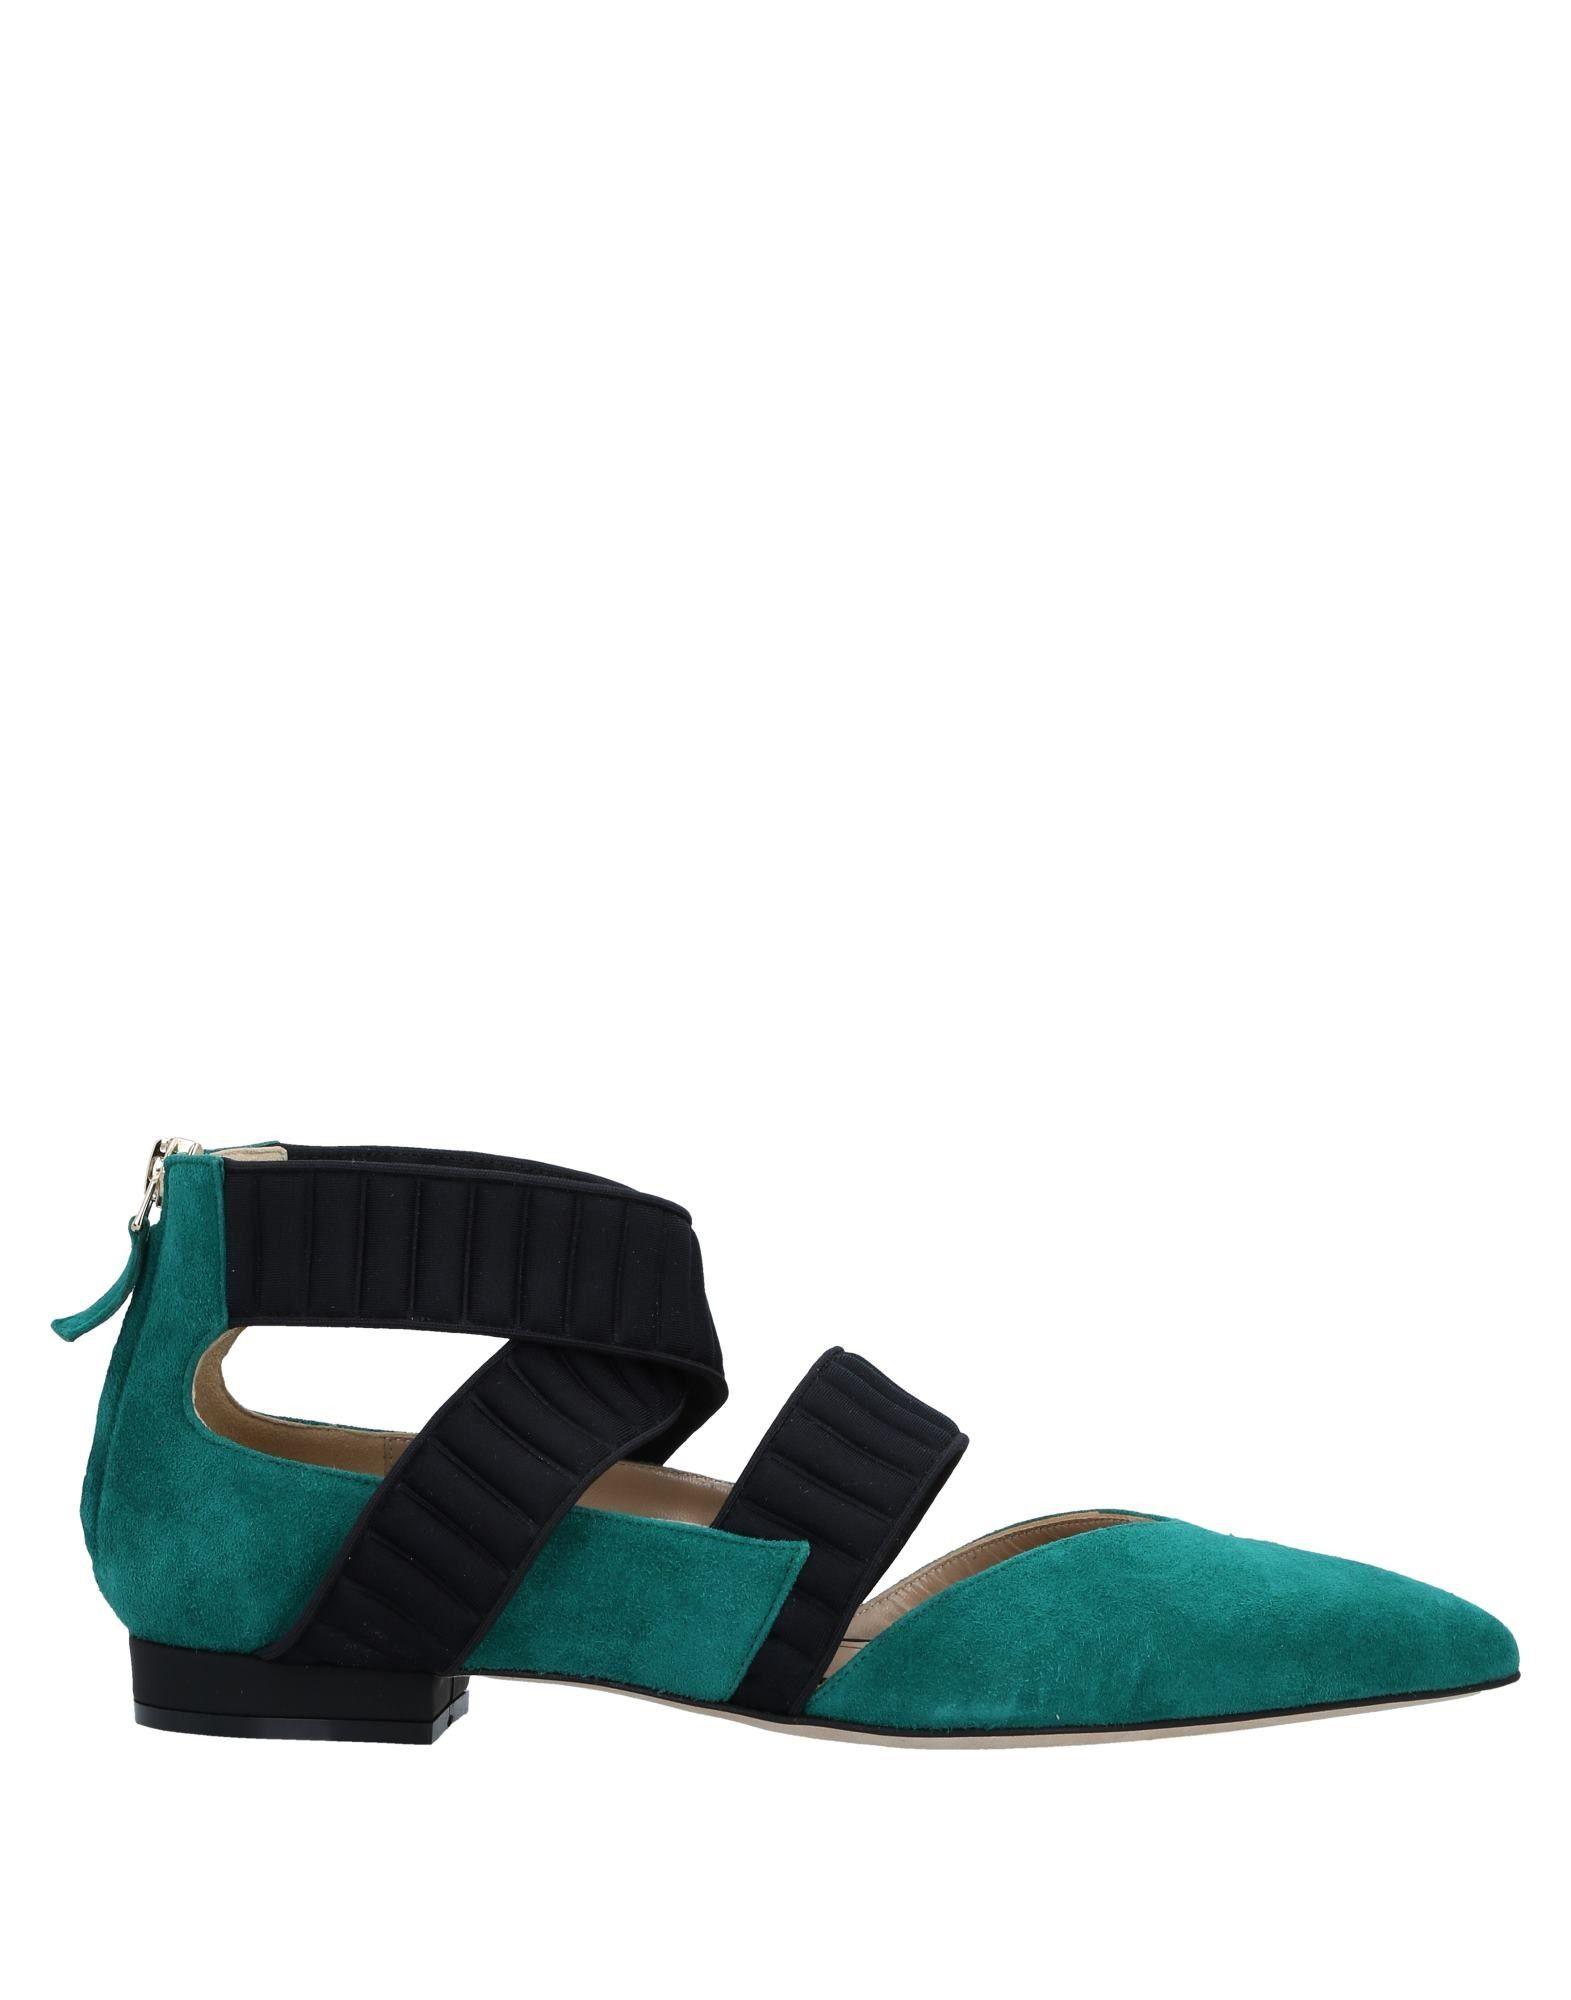 Benedetta Boroli Ballet Flats - Women Benedetta Boroli  Ballet Flats online on  Boroli Australia - 11529737VO 84fcc0